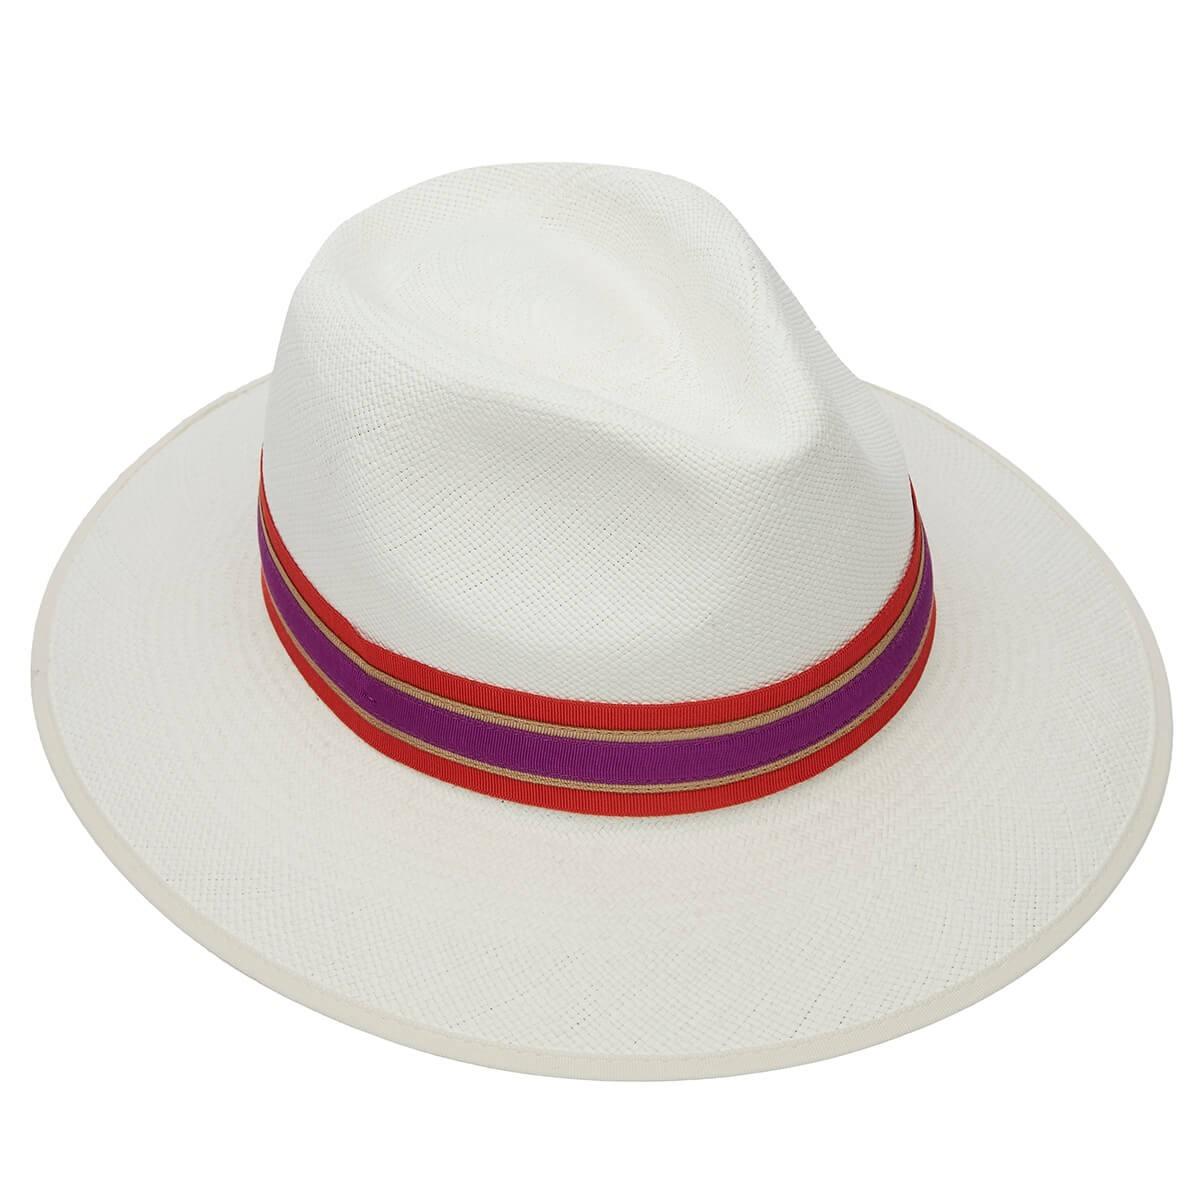 eb906deef Men s Designer Trilby Hats - Luxury Brands - Harvey Nichols